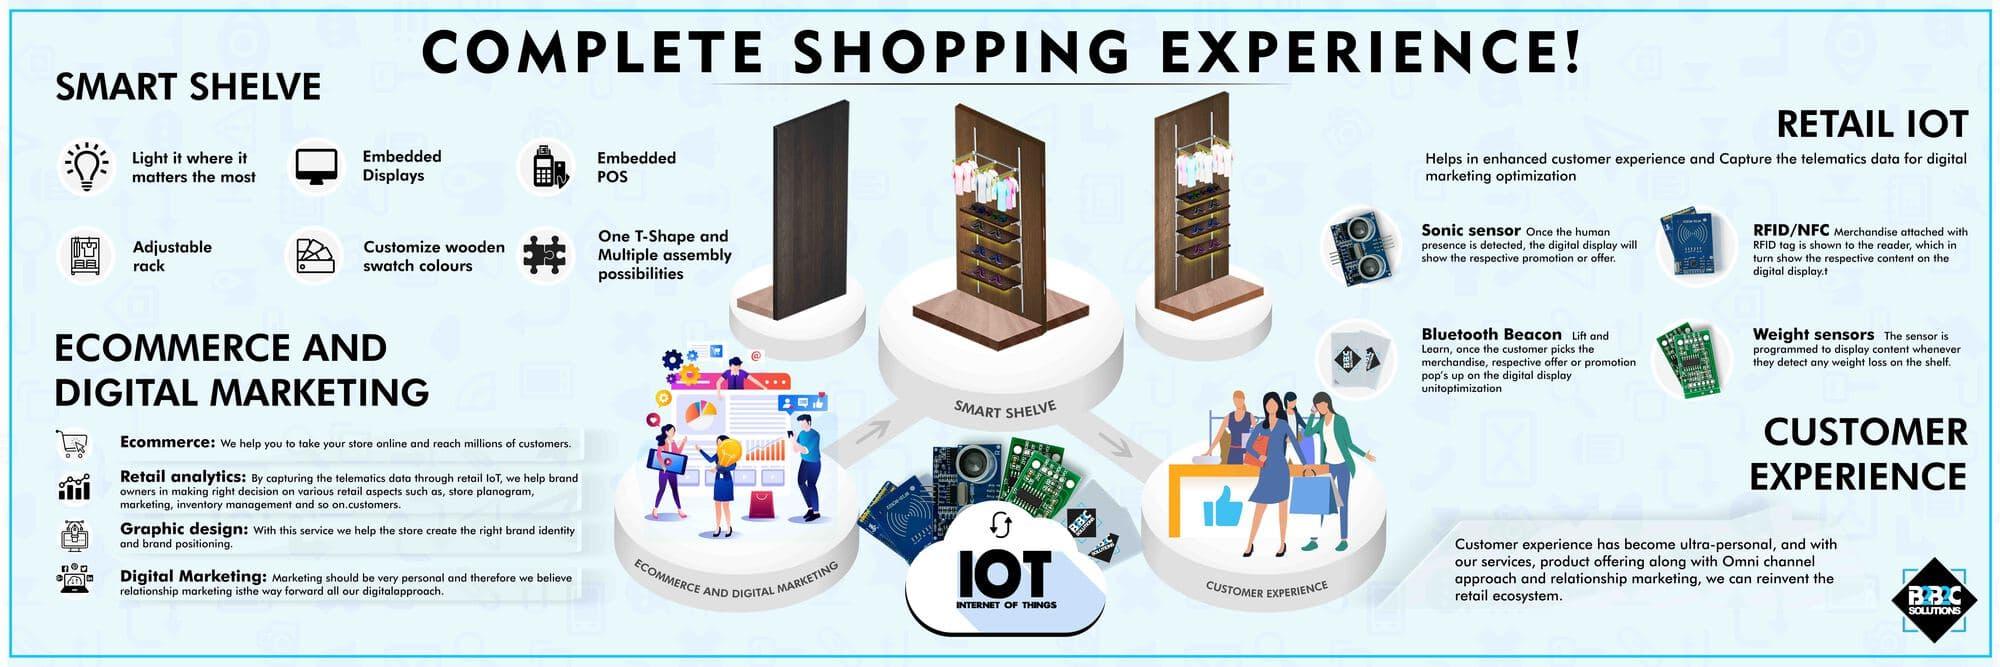 B2b2c Solutions -Smart Retail Solution